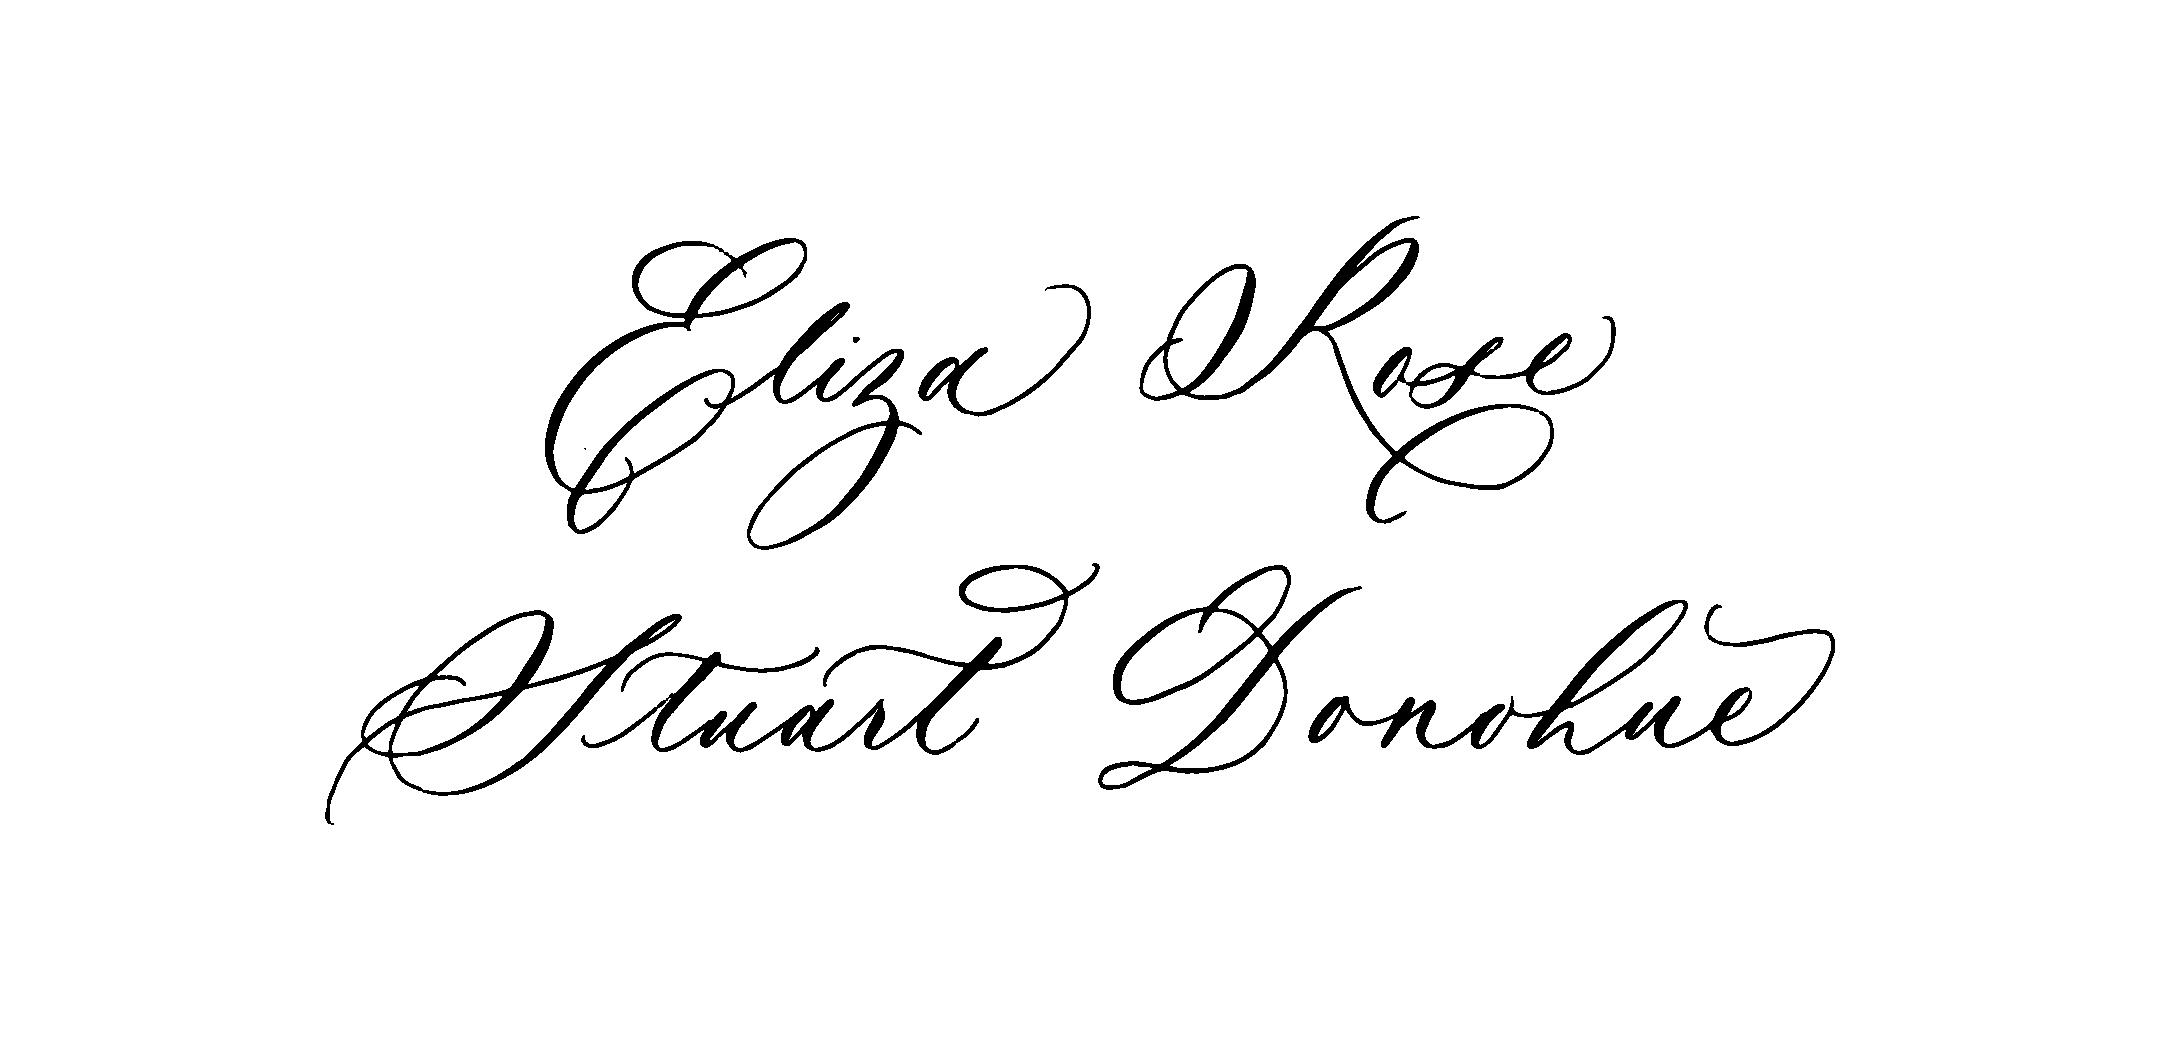 Elegant calligraphy style.